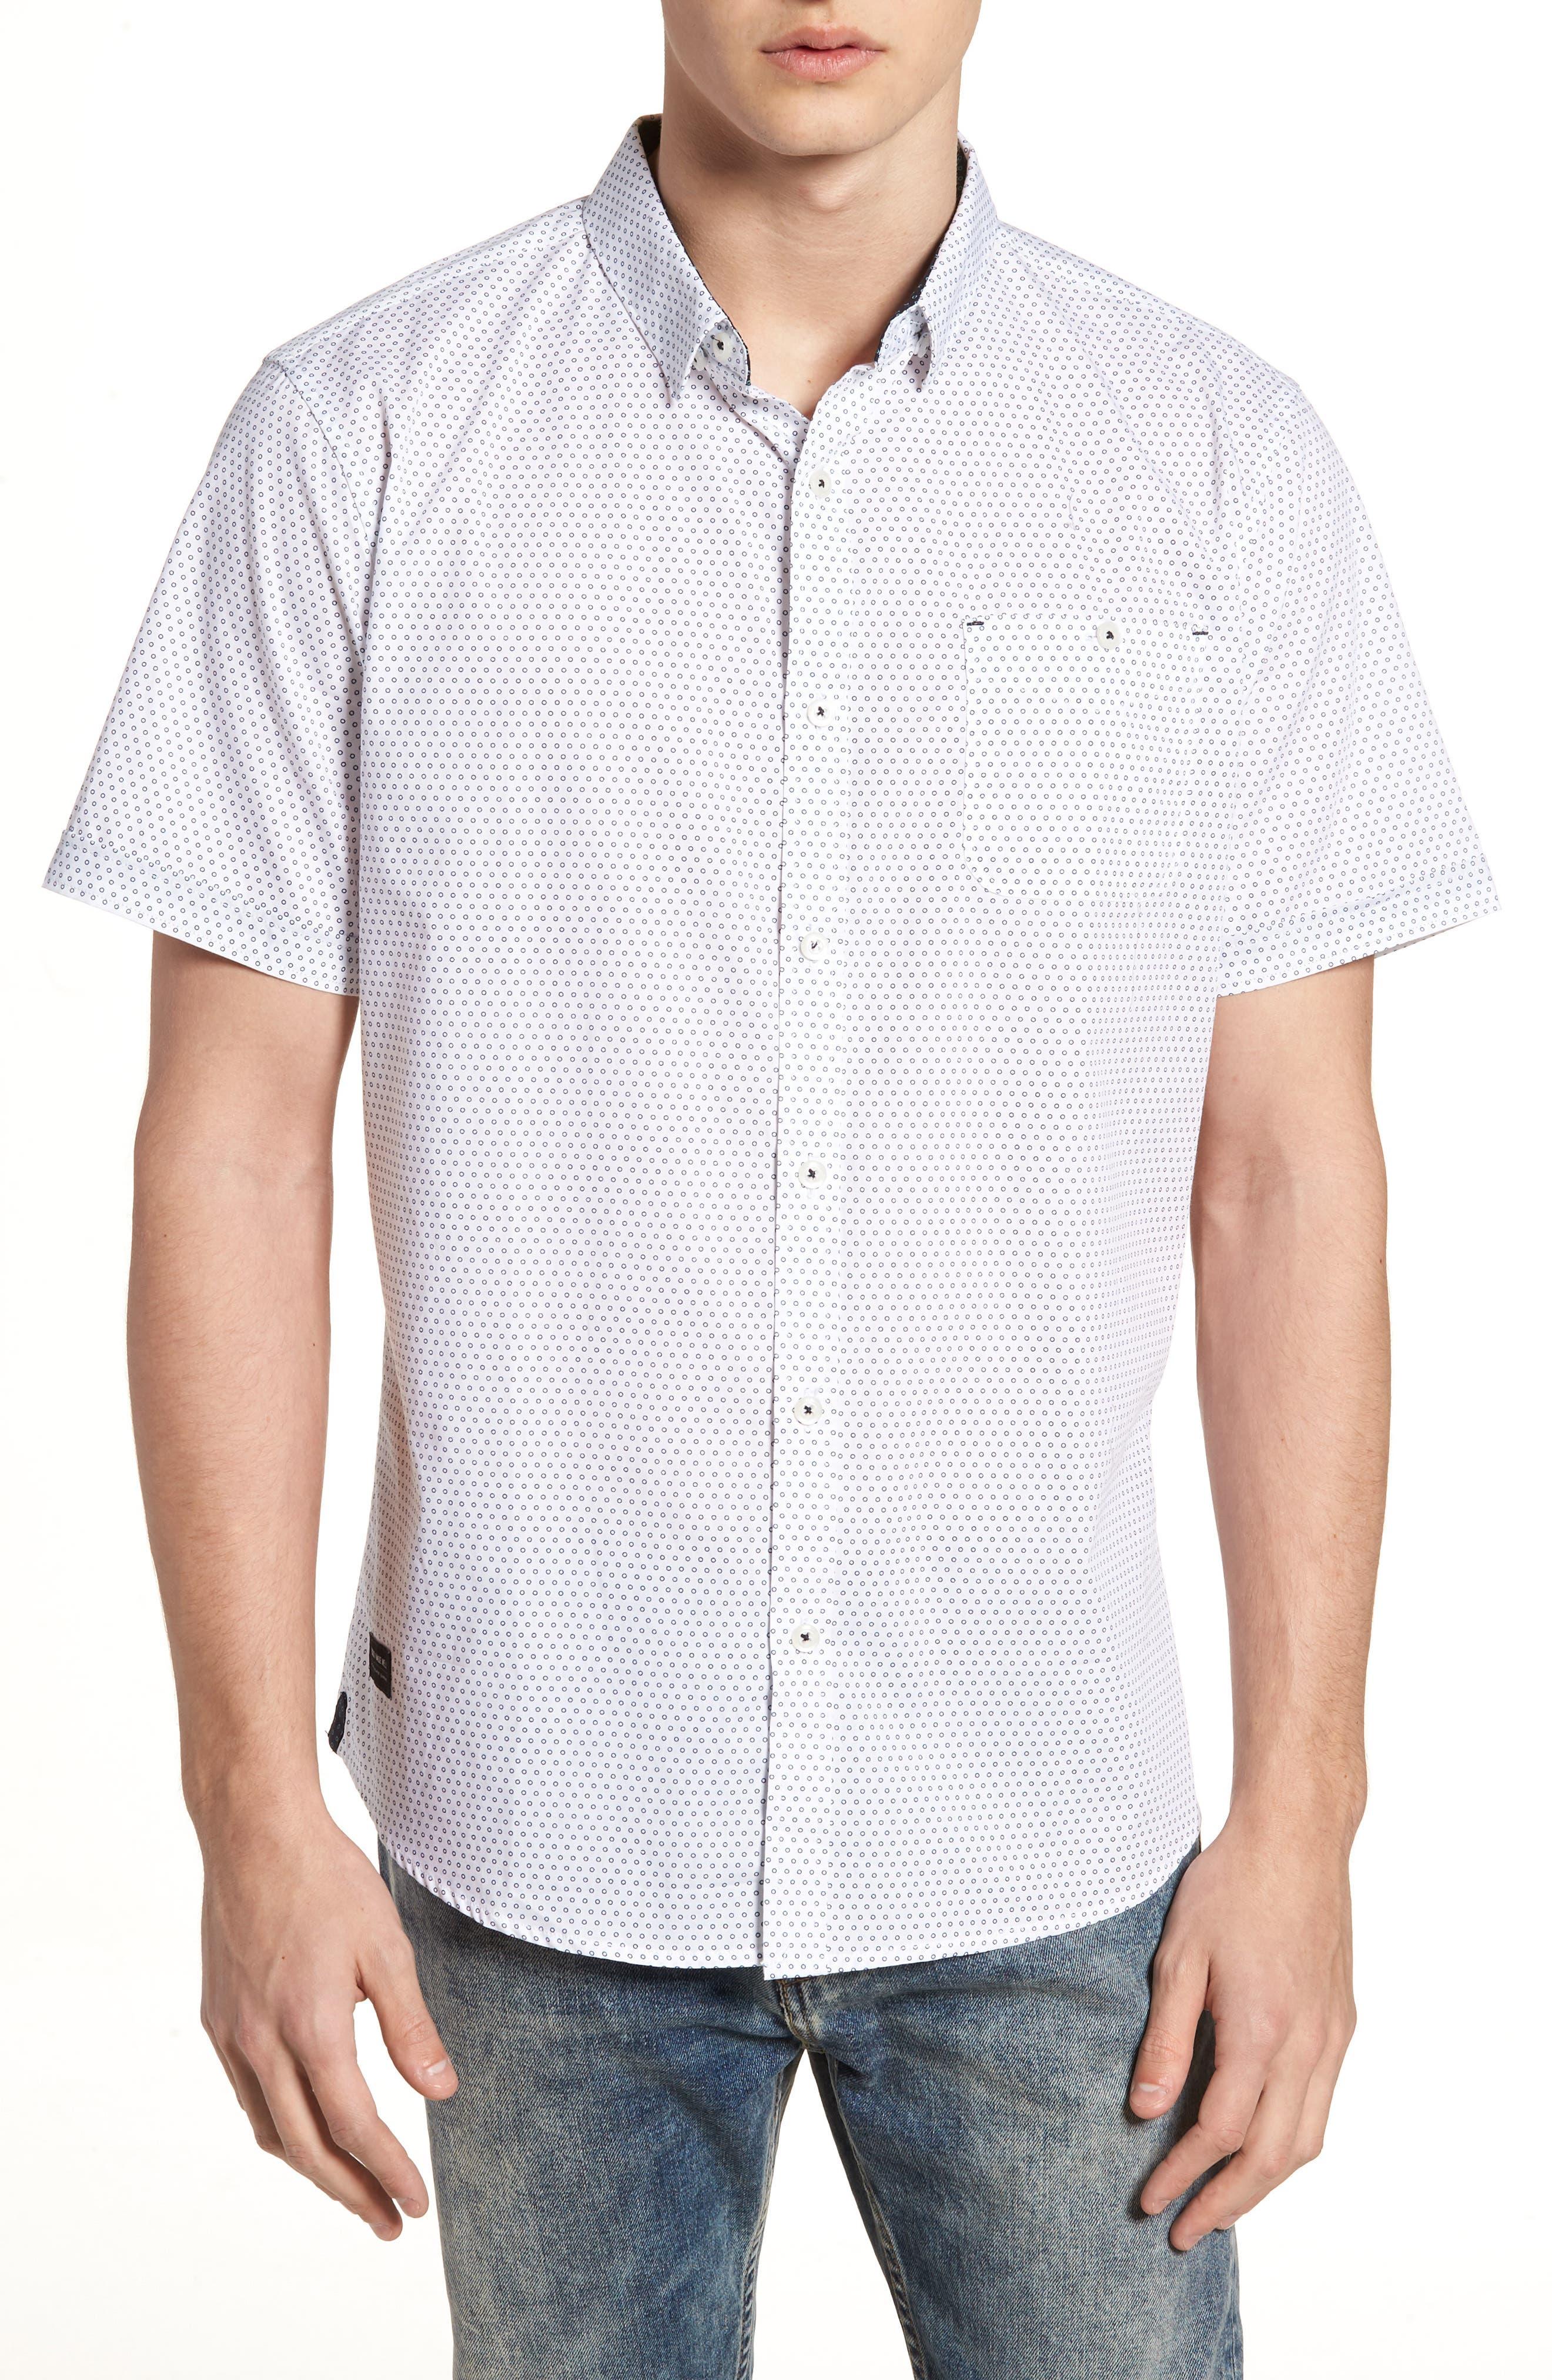 Lights of Home Slim Fit Short Sleeve Sport Shirt,                         Main,                         color, White